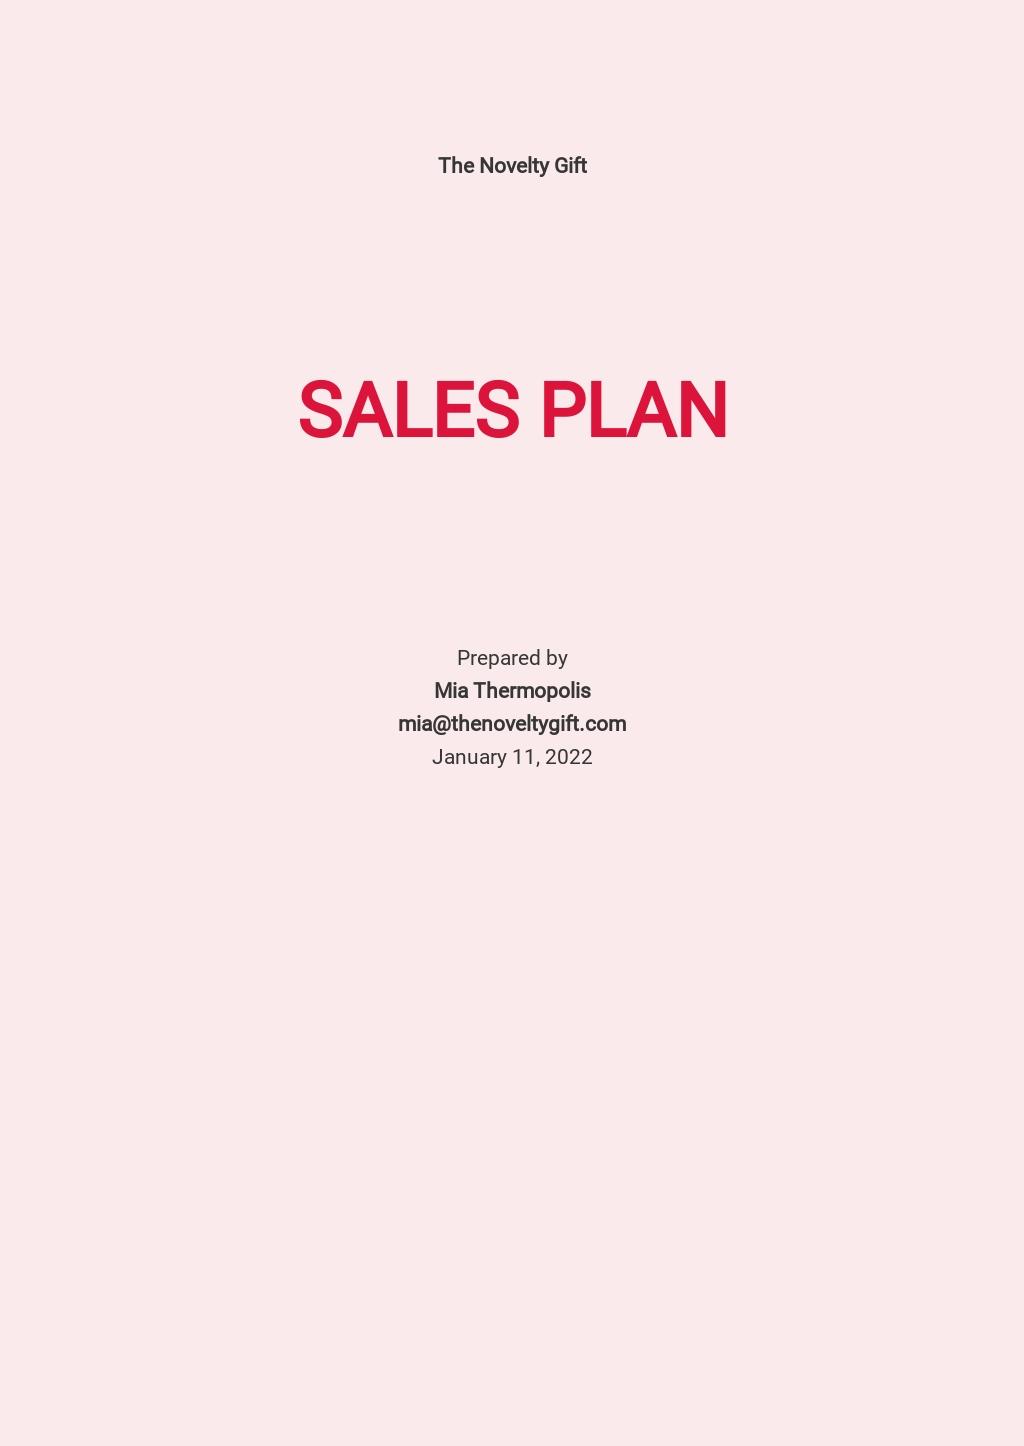 Gift Shop Sales Plan Template